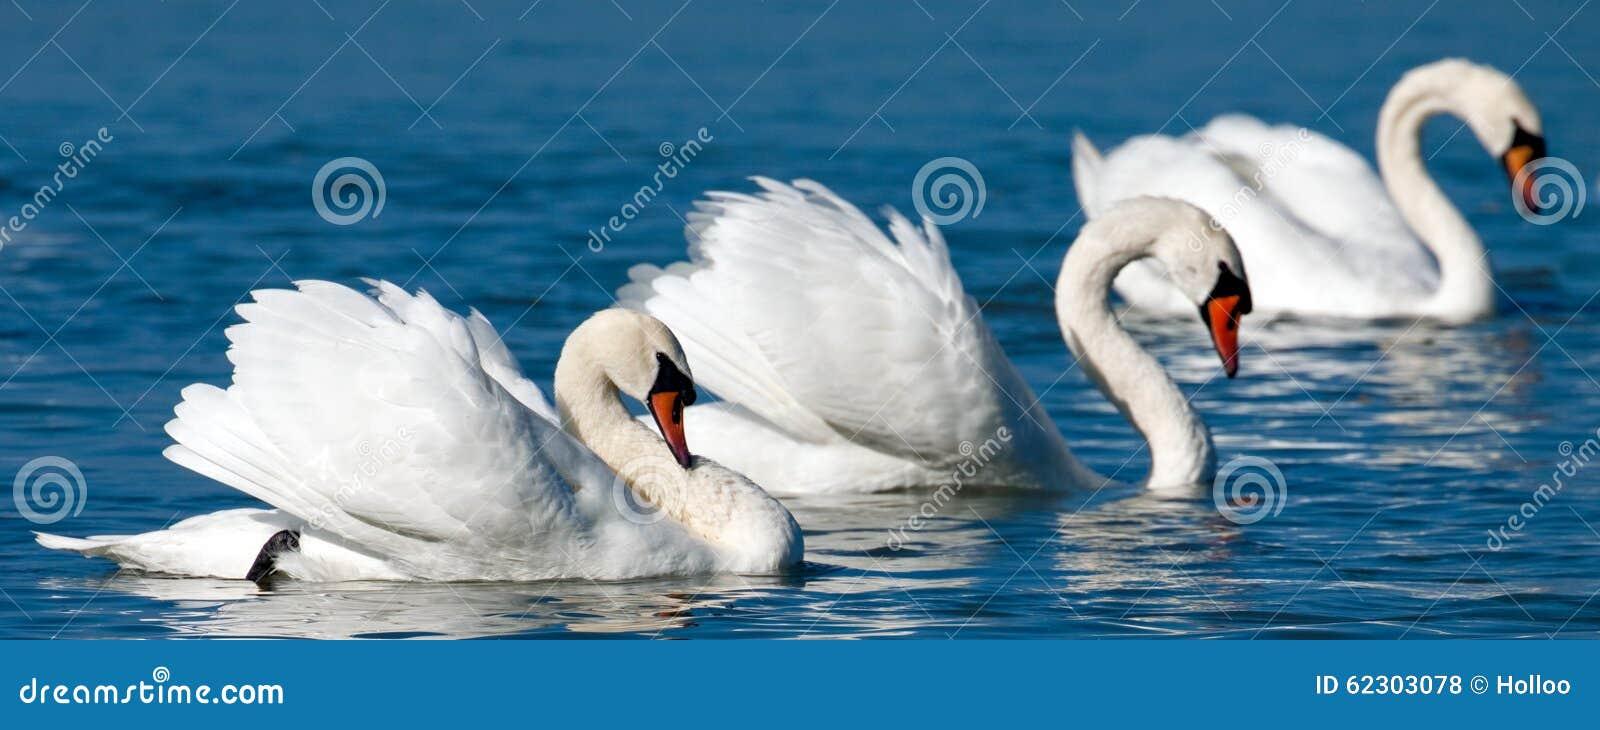 Swans Stock Photo - Image: 62303078